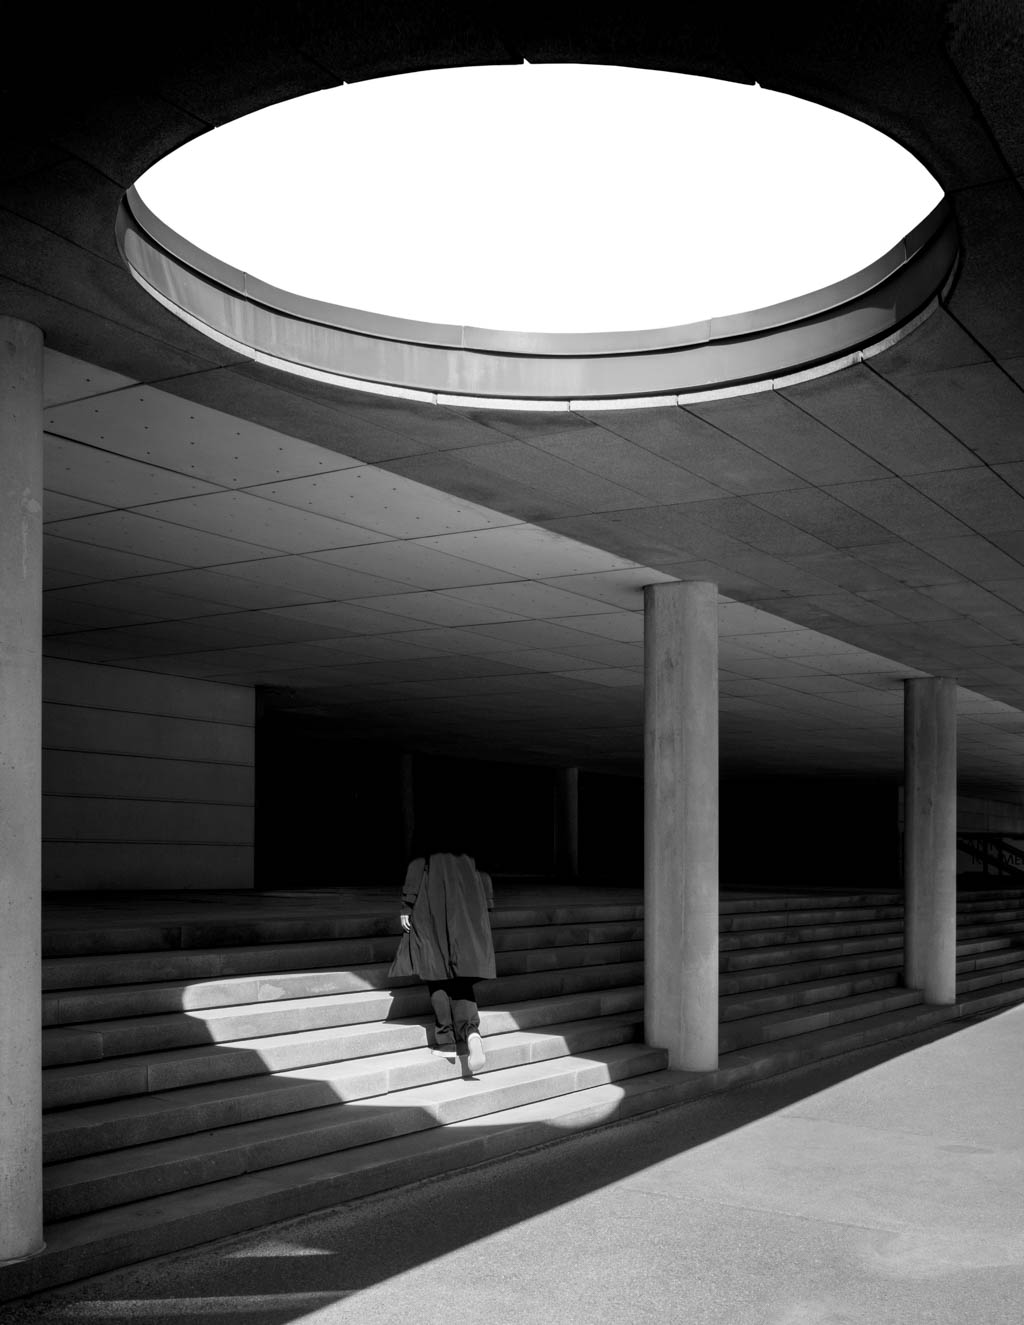 JonasBjerrePoulsen_Chiaroscuro_III_Architectura_Web_1024x1325px